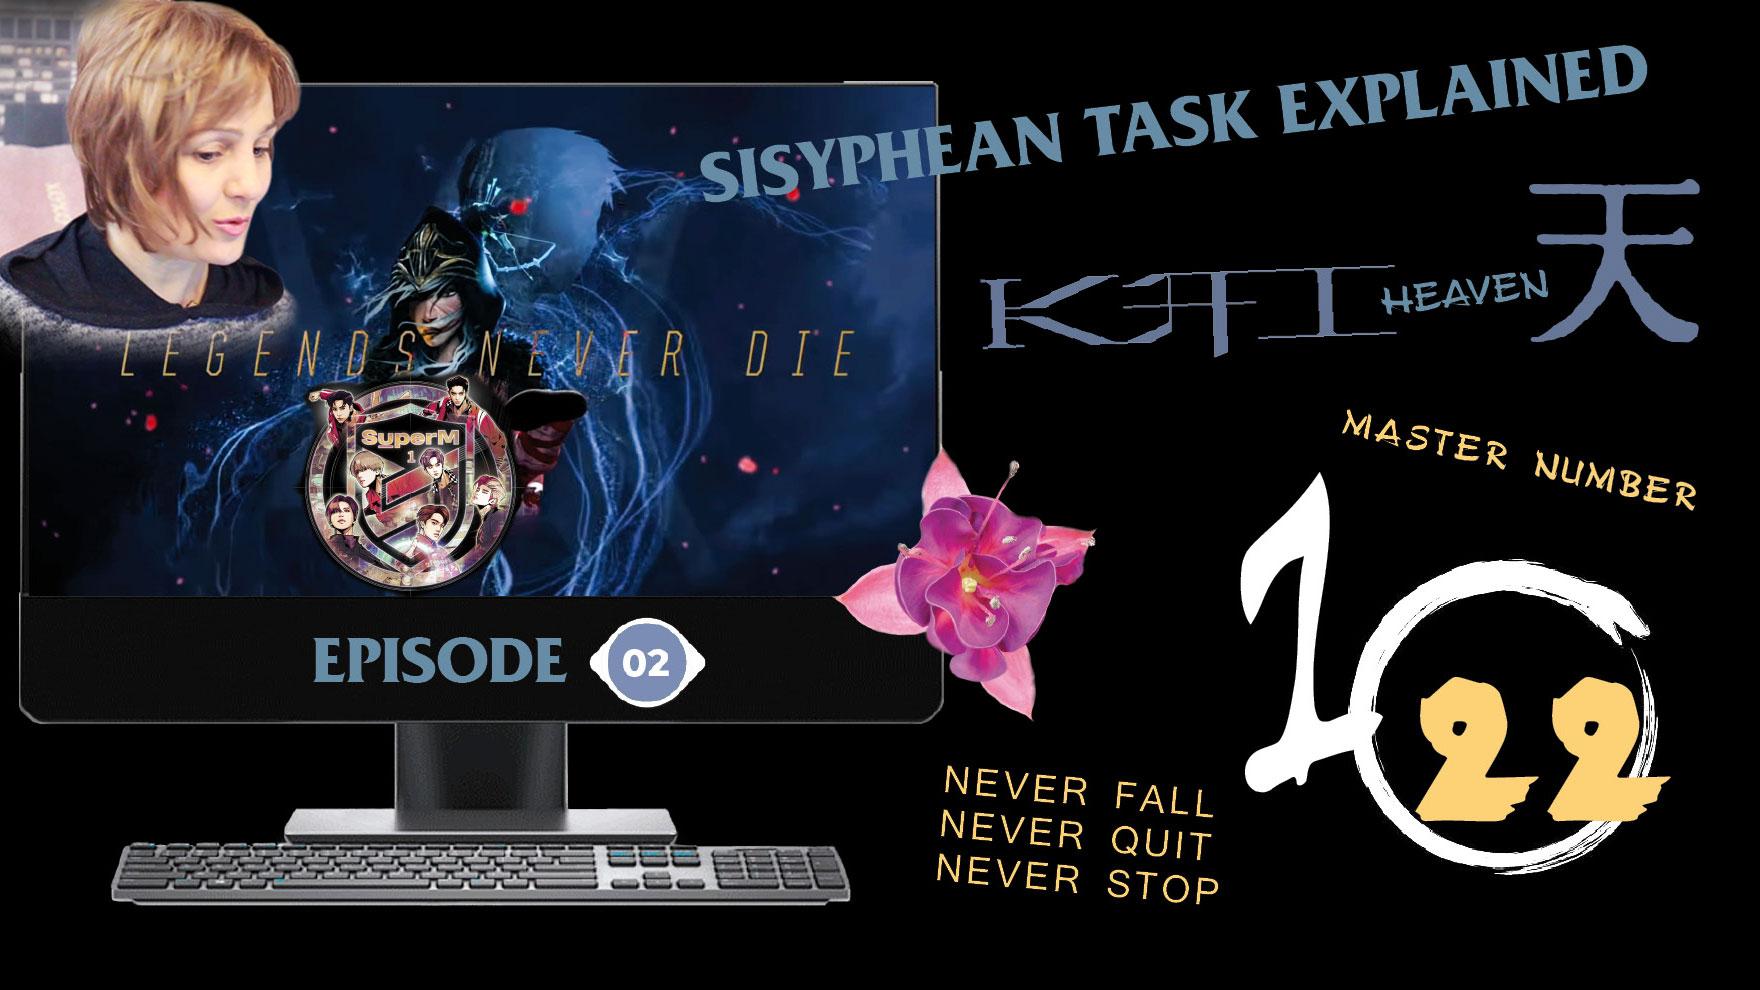 Farewell 2020 | SuperM, Kai, Ten, Baek, Master Number 22 & Sisyphus myth explained